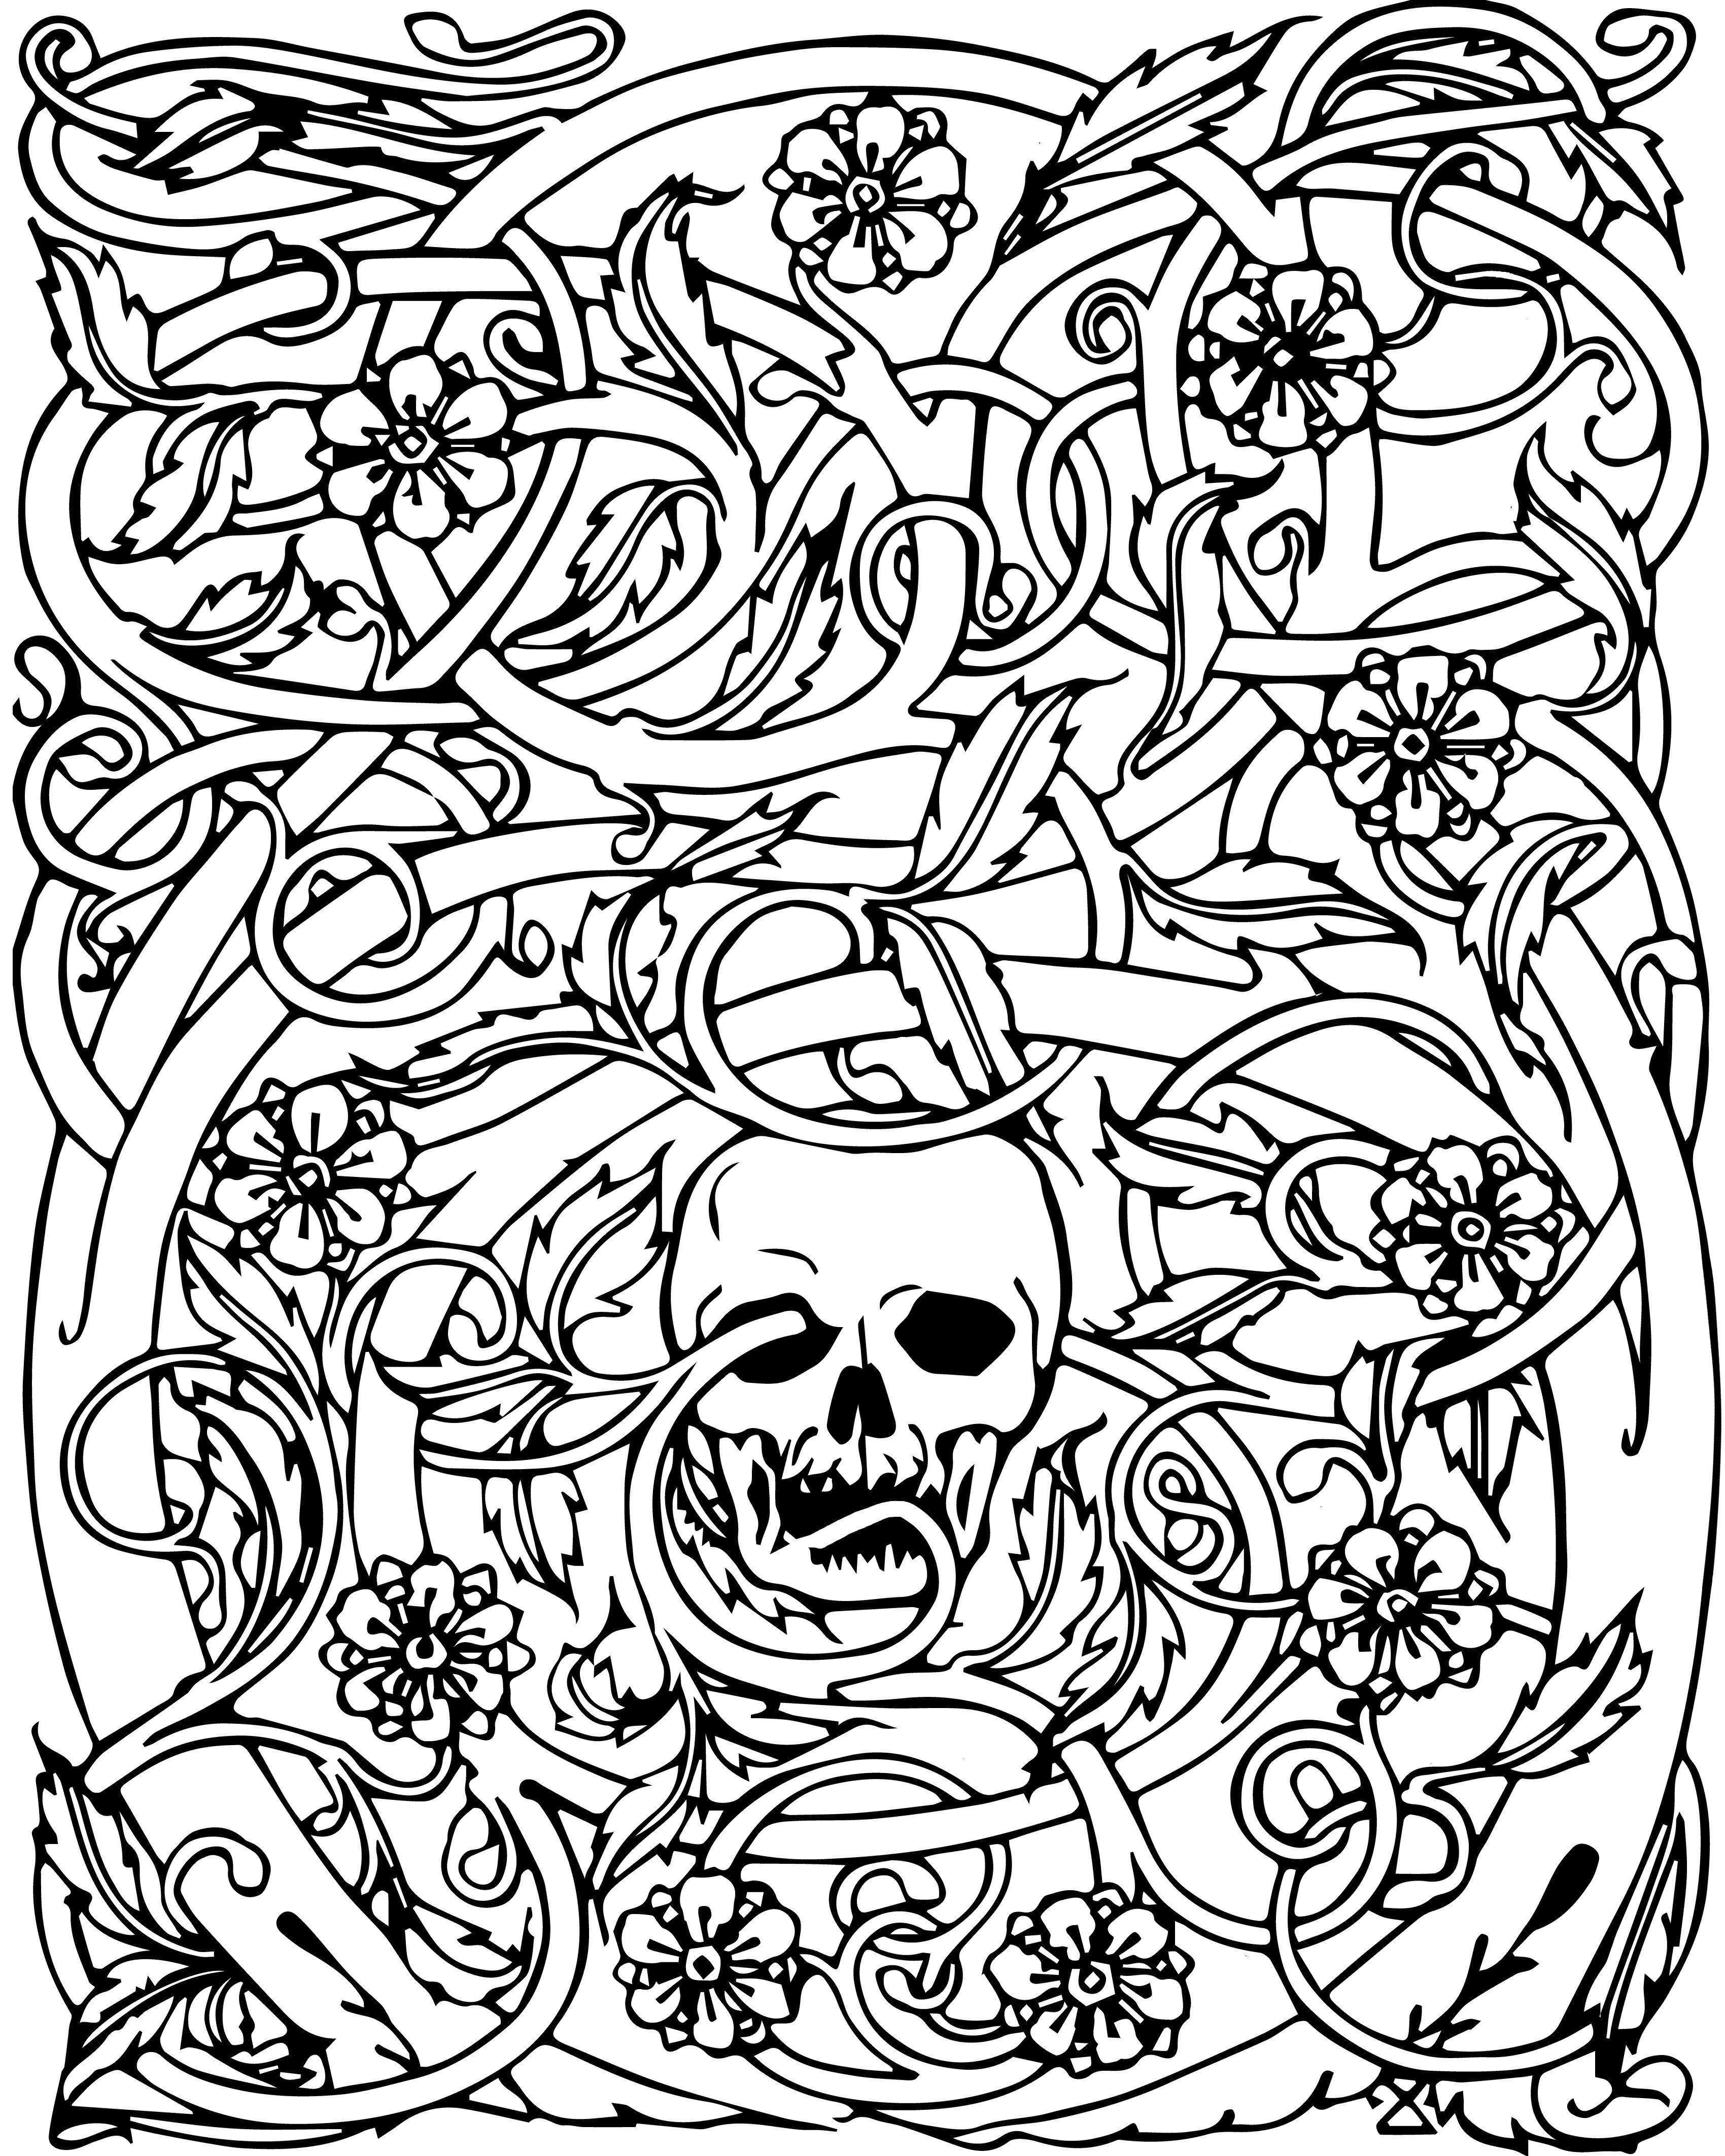 Jack O Lantern Coloring Pages New Halloween Mandala Einzigartig Coloring Ideas Skull Coloring Pages Halloween Coloring Book Halloween Coloring Pages Printable